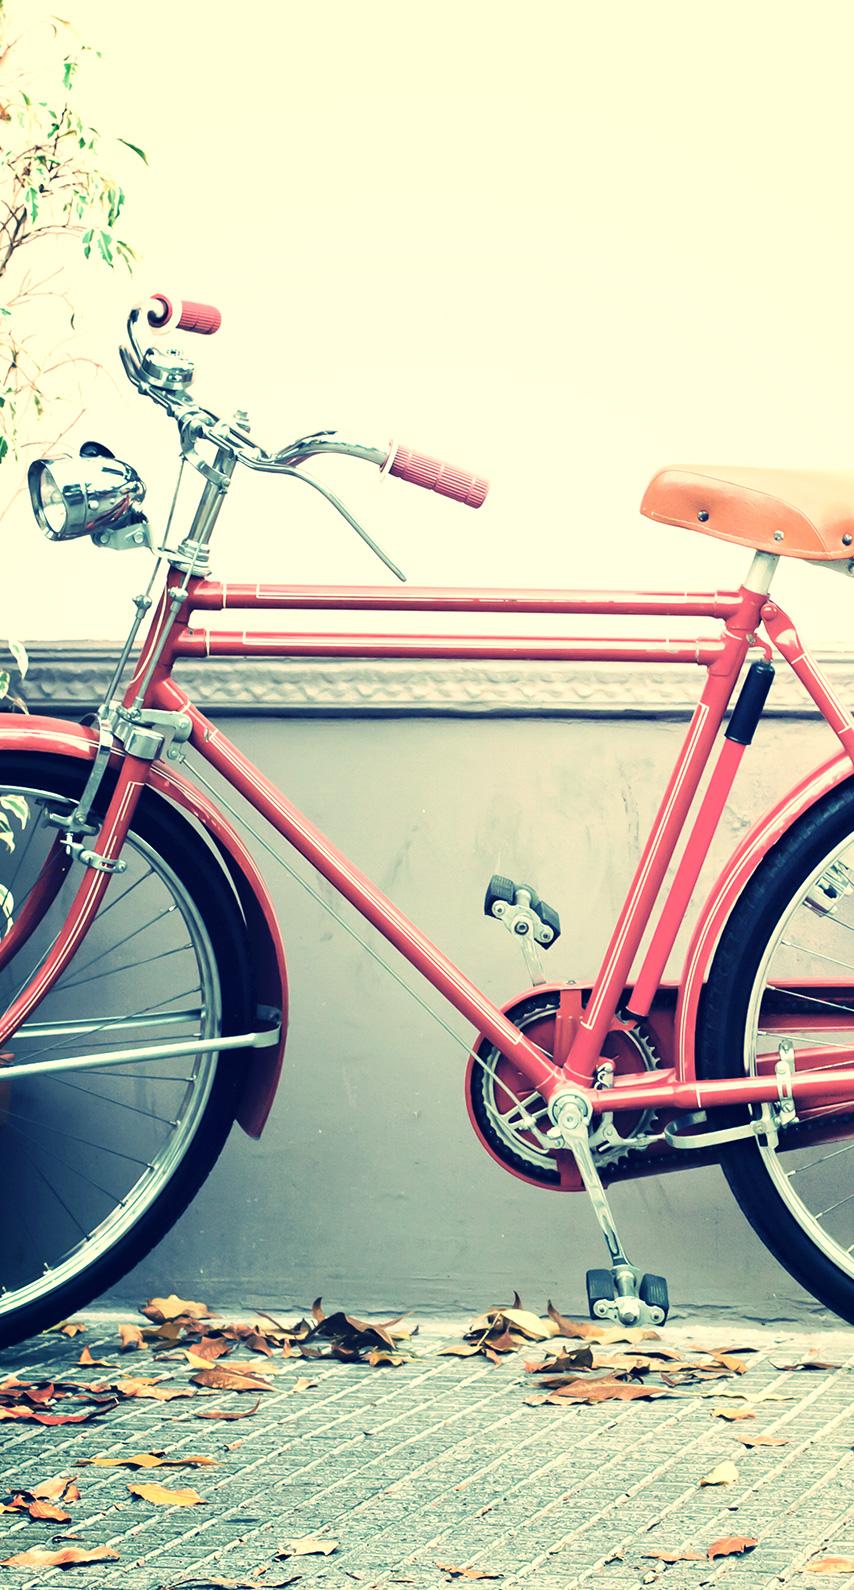 land vehicle, bicycle wheel